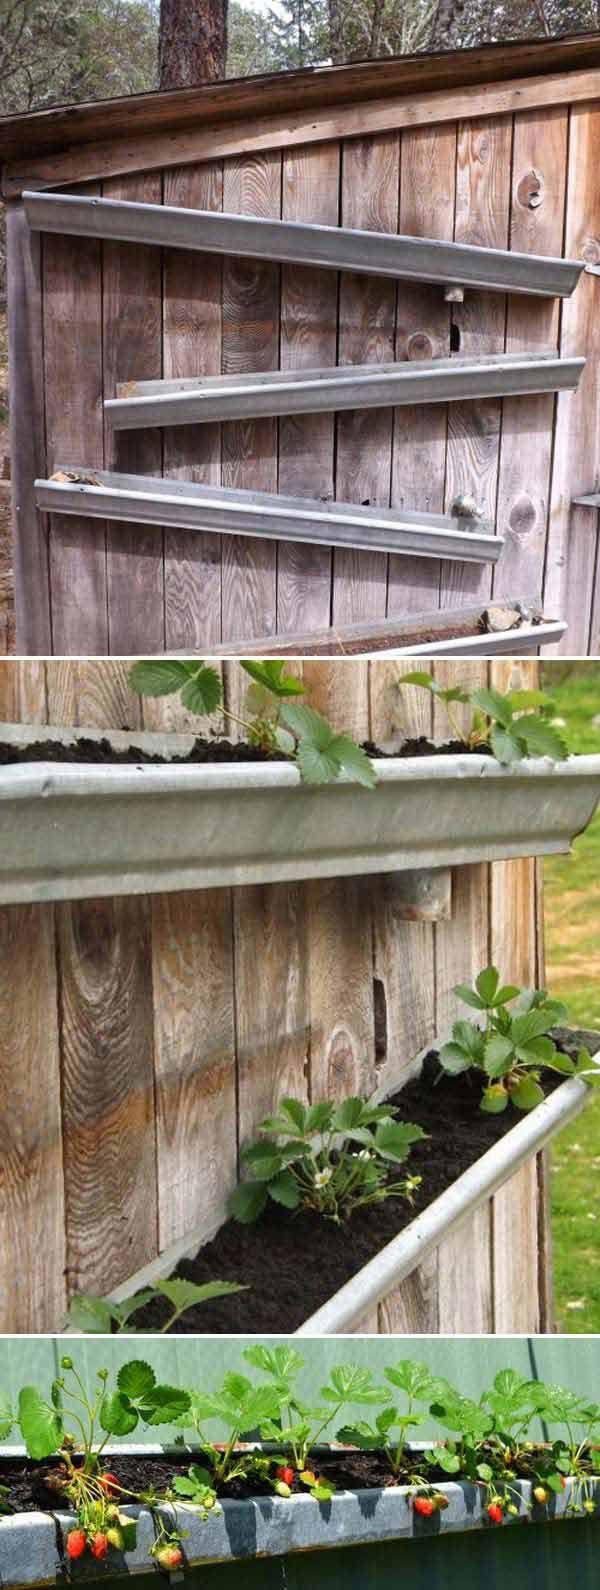 Interior designs medium size vertically growing onions growing onions - Grow Vertical Strawberry Garden In 10 Diy Ways